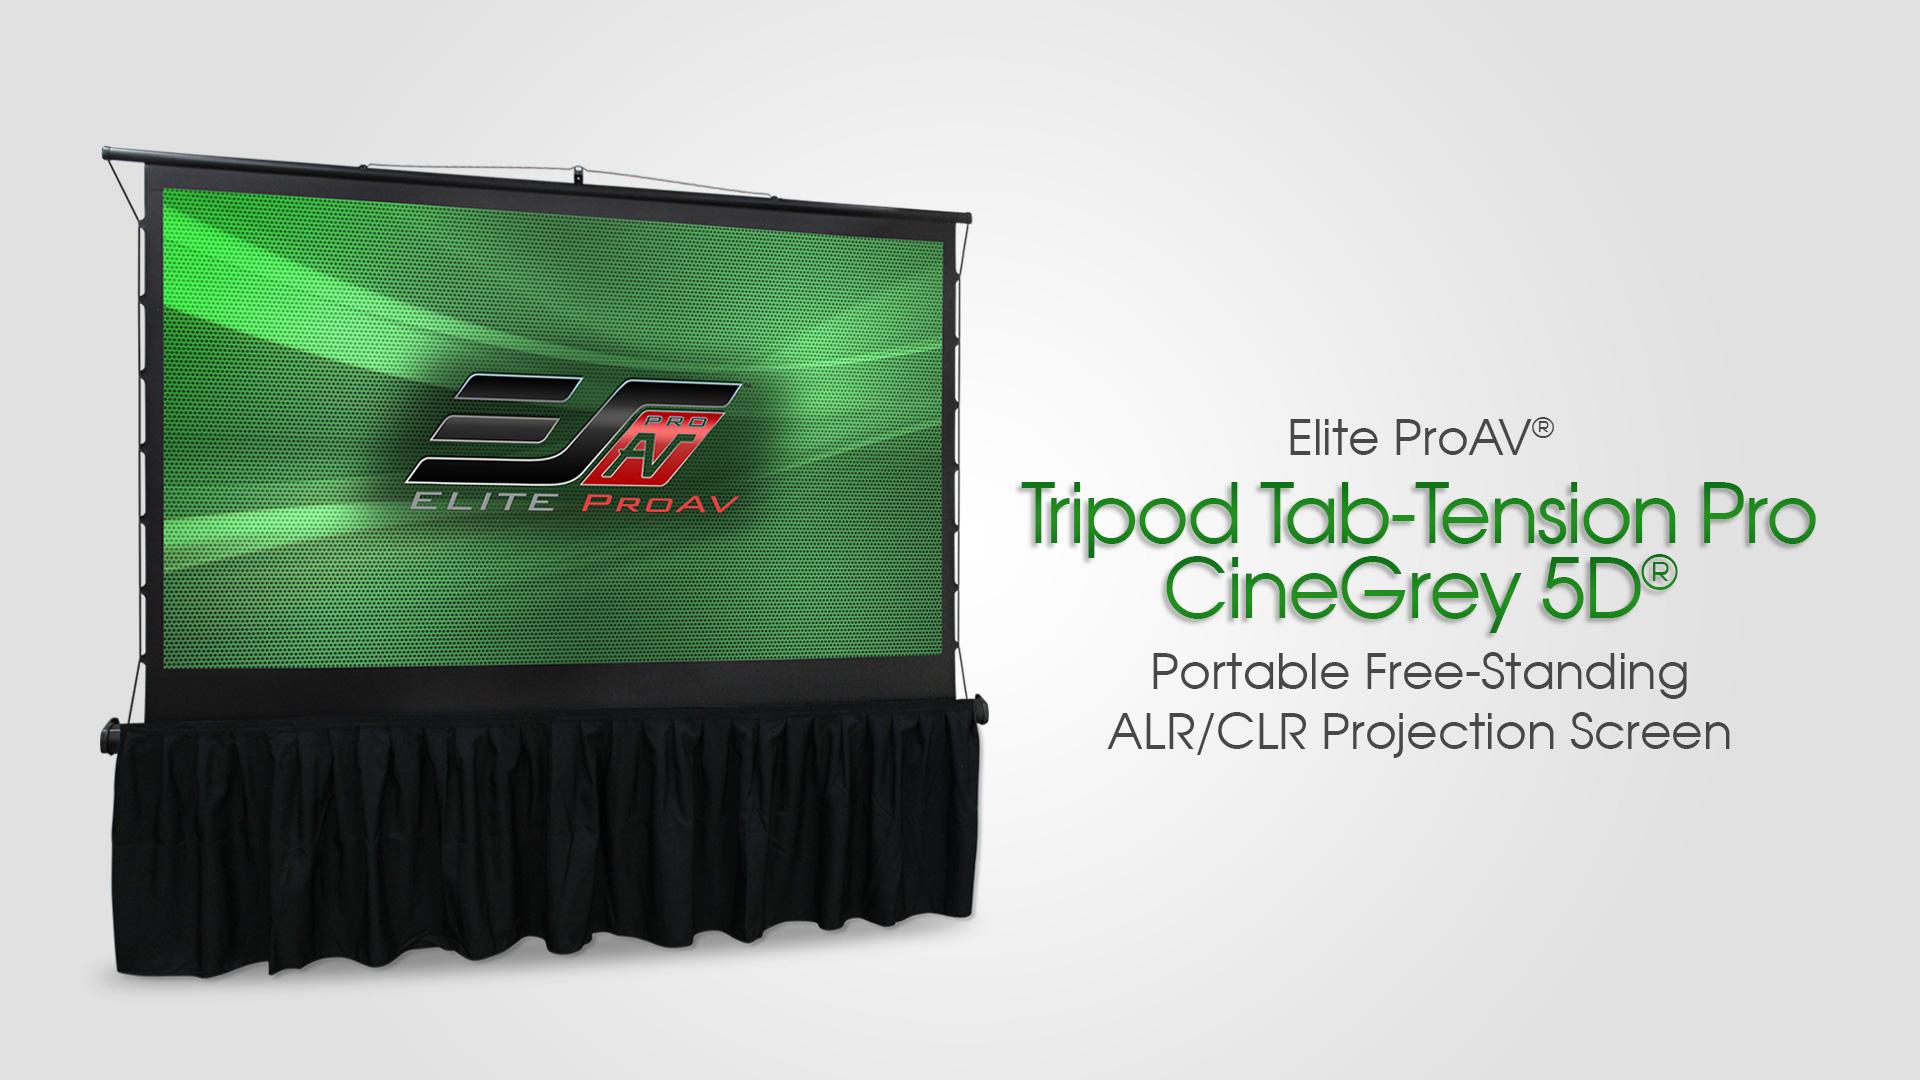 Tripod Tab-Tension Pro CineGrey 5D® Product Video